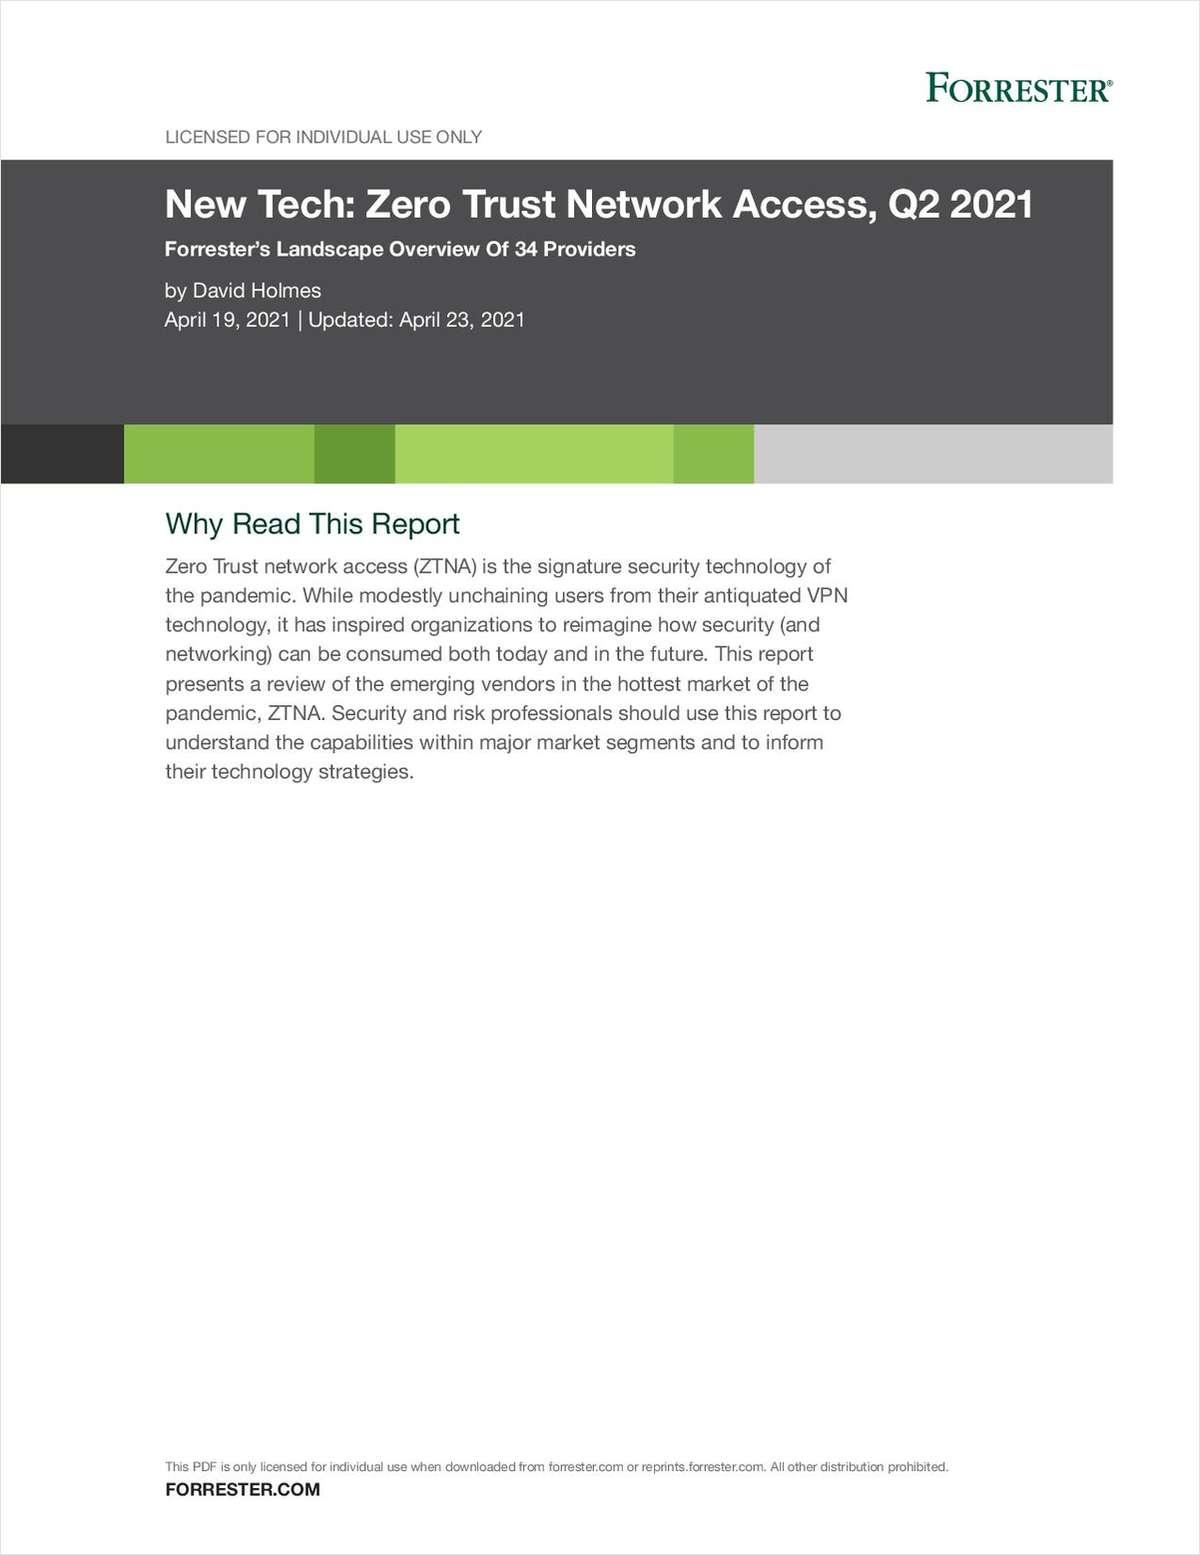 New Tech: Zero Trust Network Access